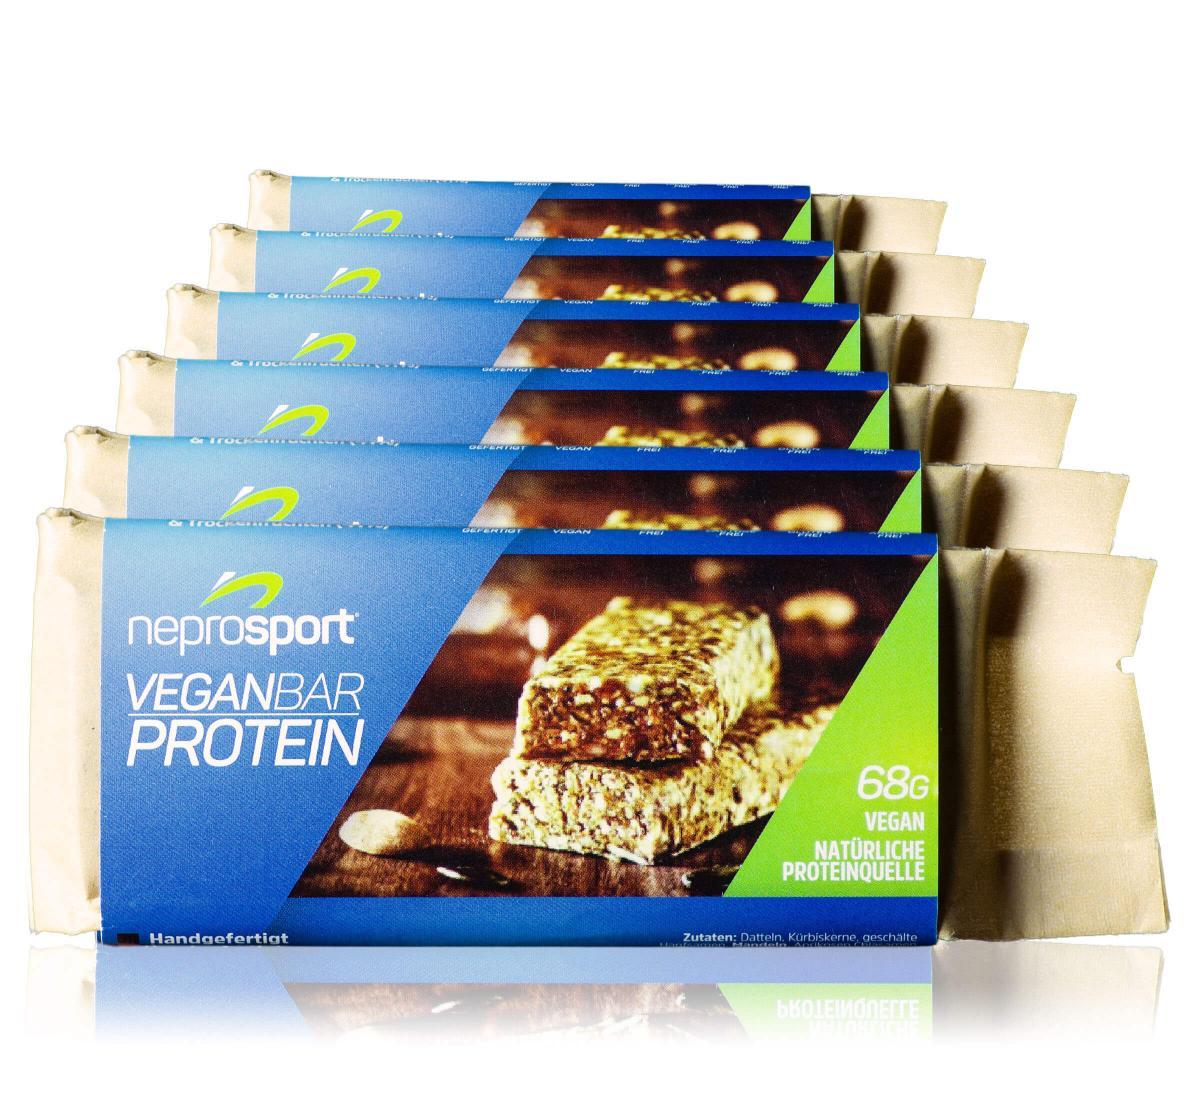 Vegan Bar Protein